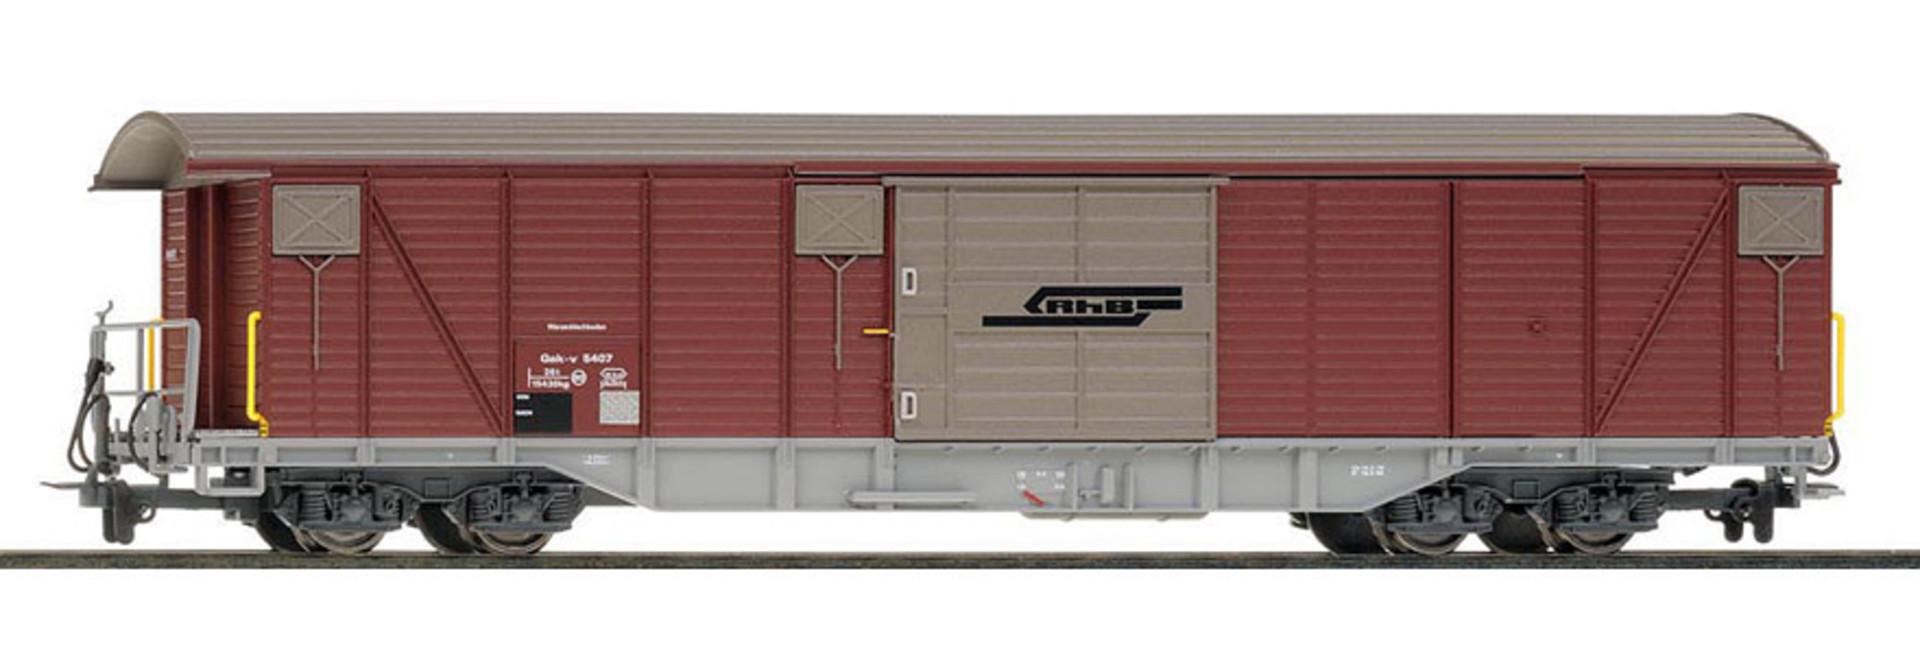 2278177 RhB Gak-v 5407 Großraumgüterwagen